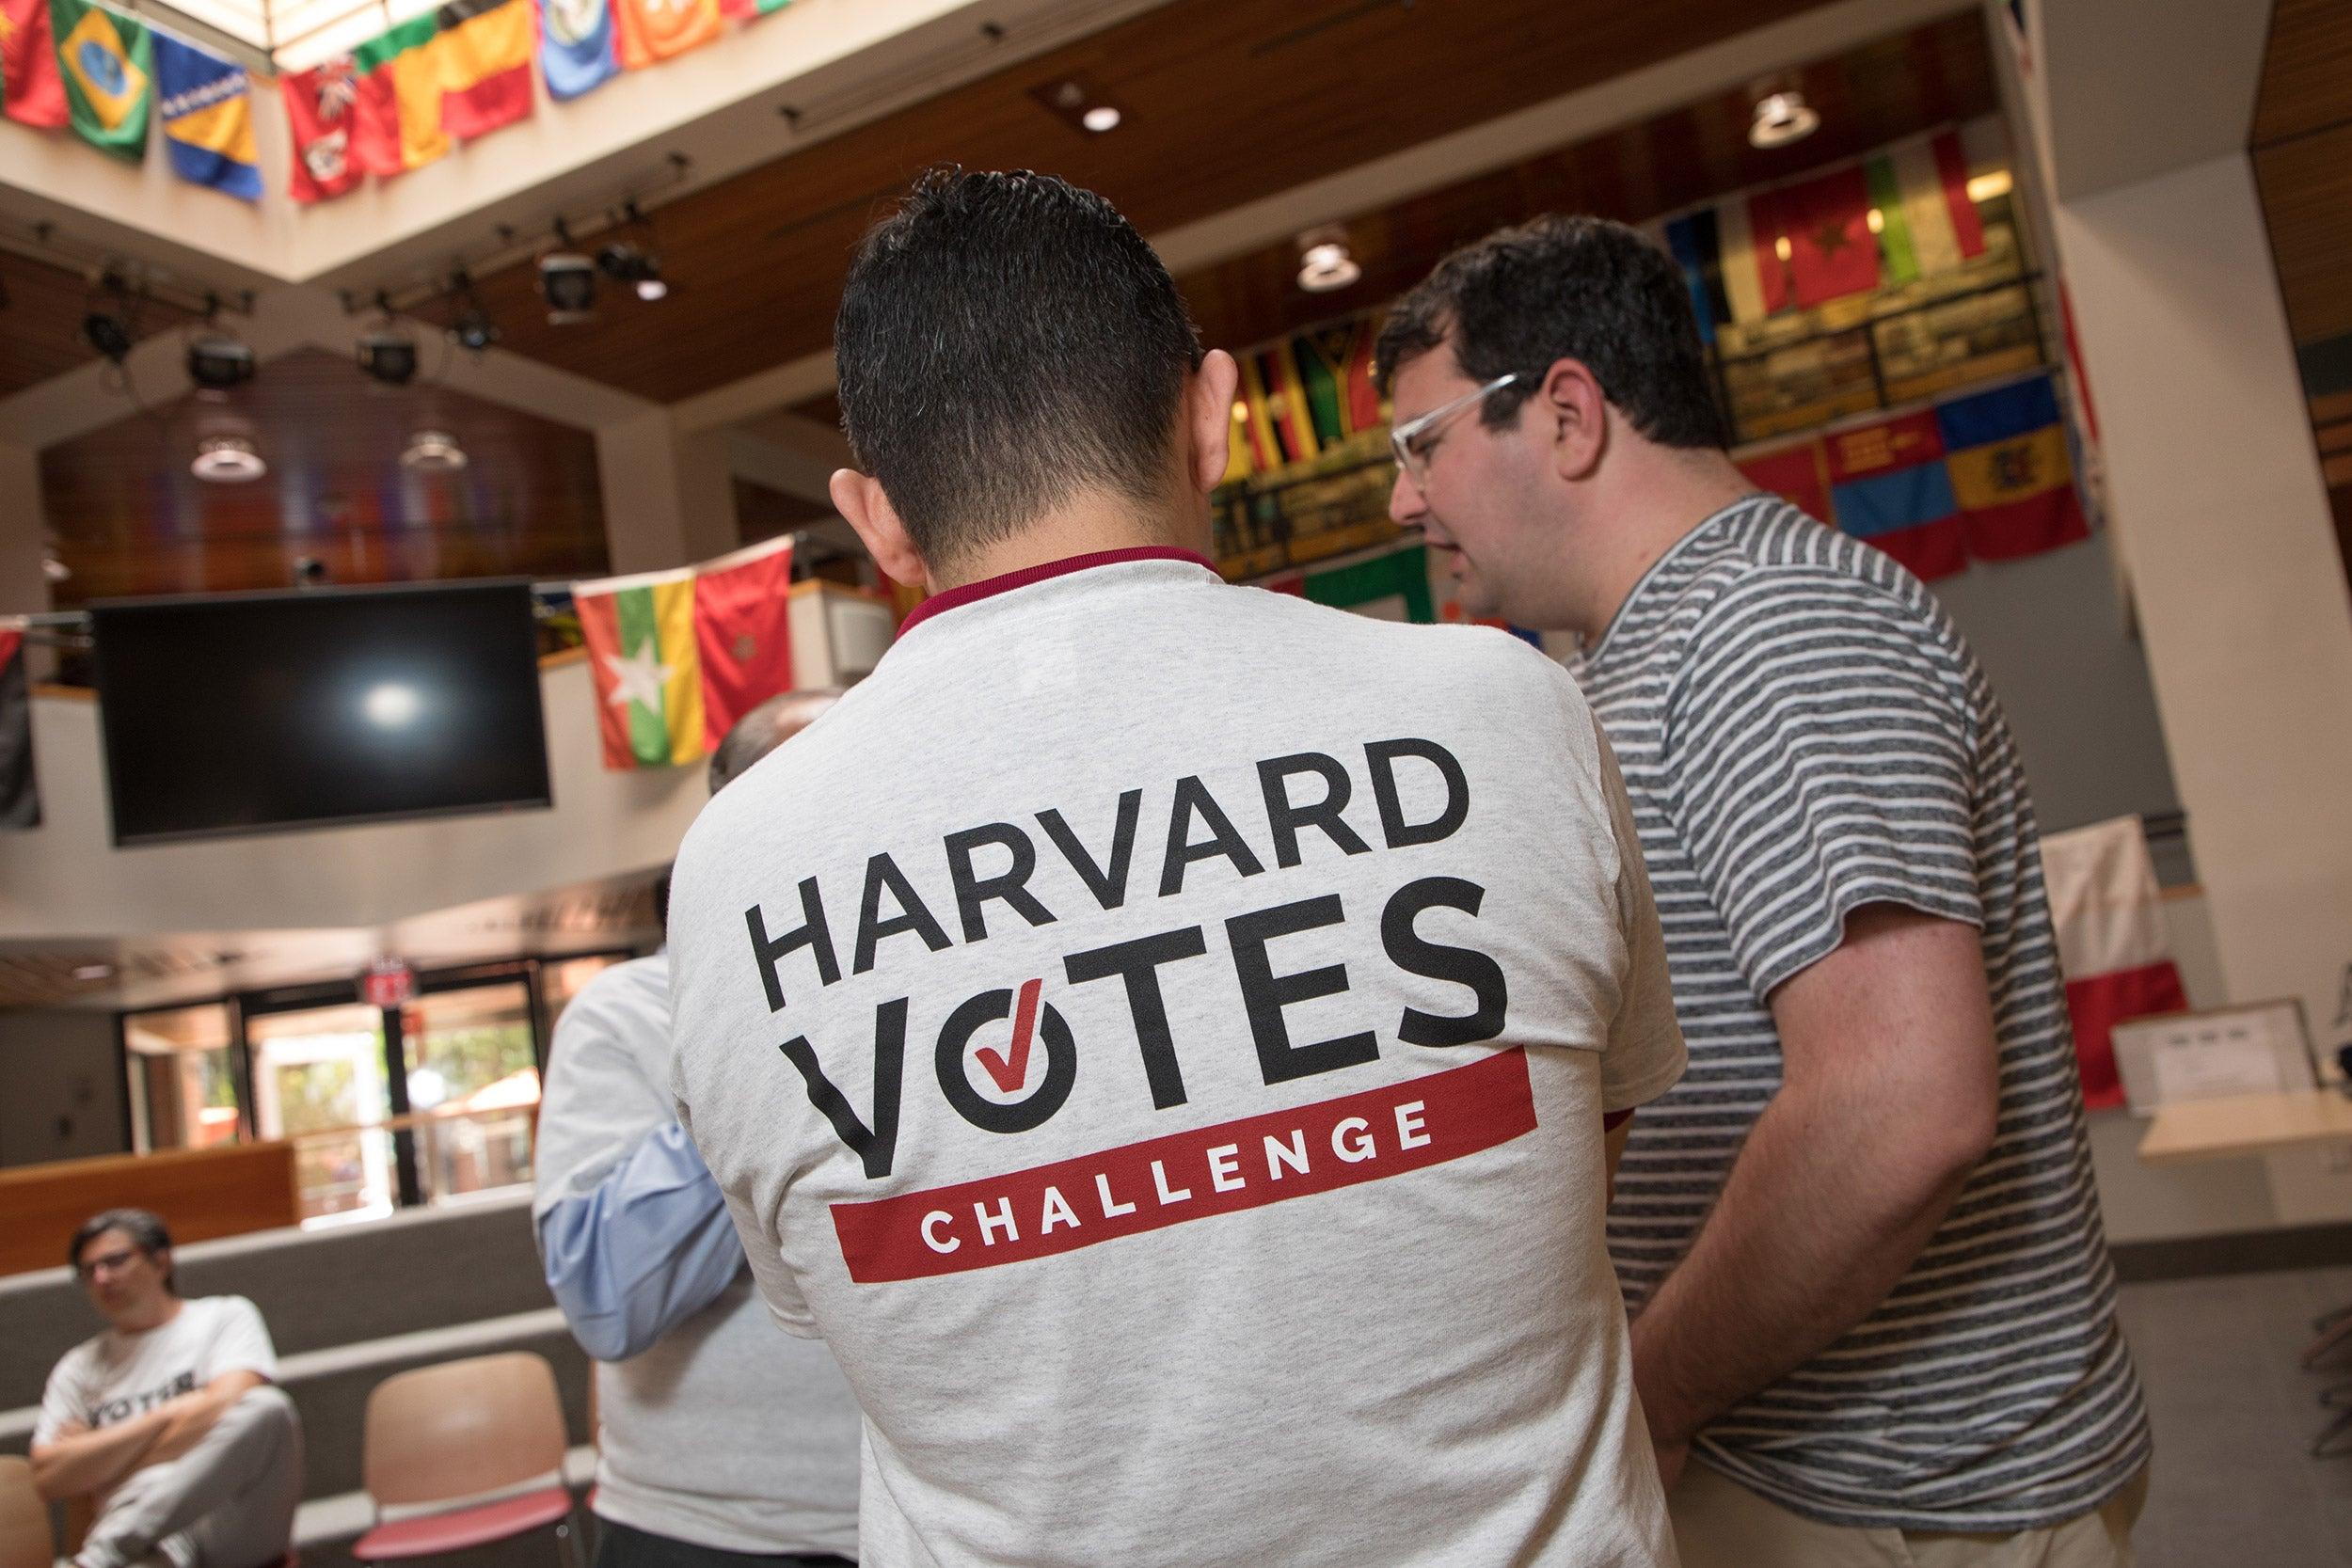 Harvard Votes Challenge event